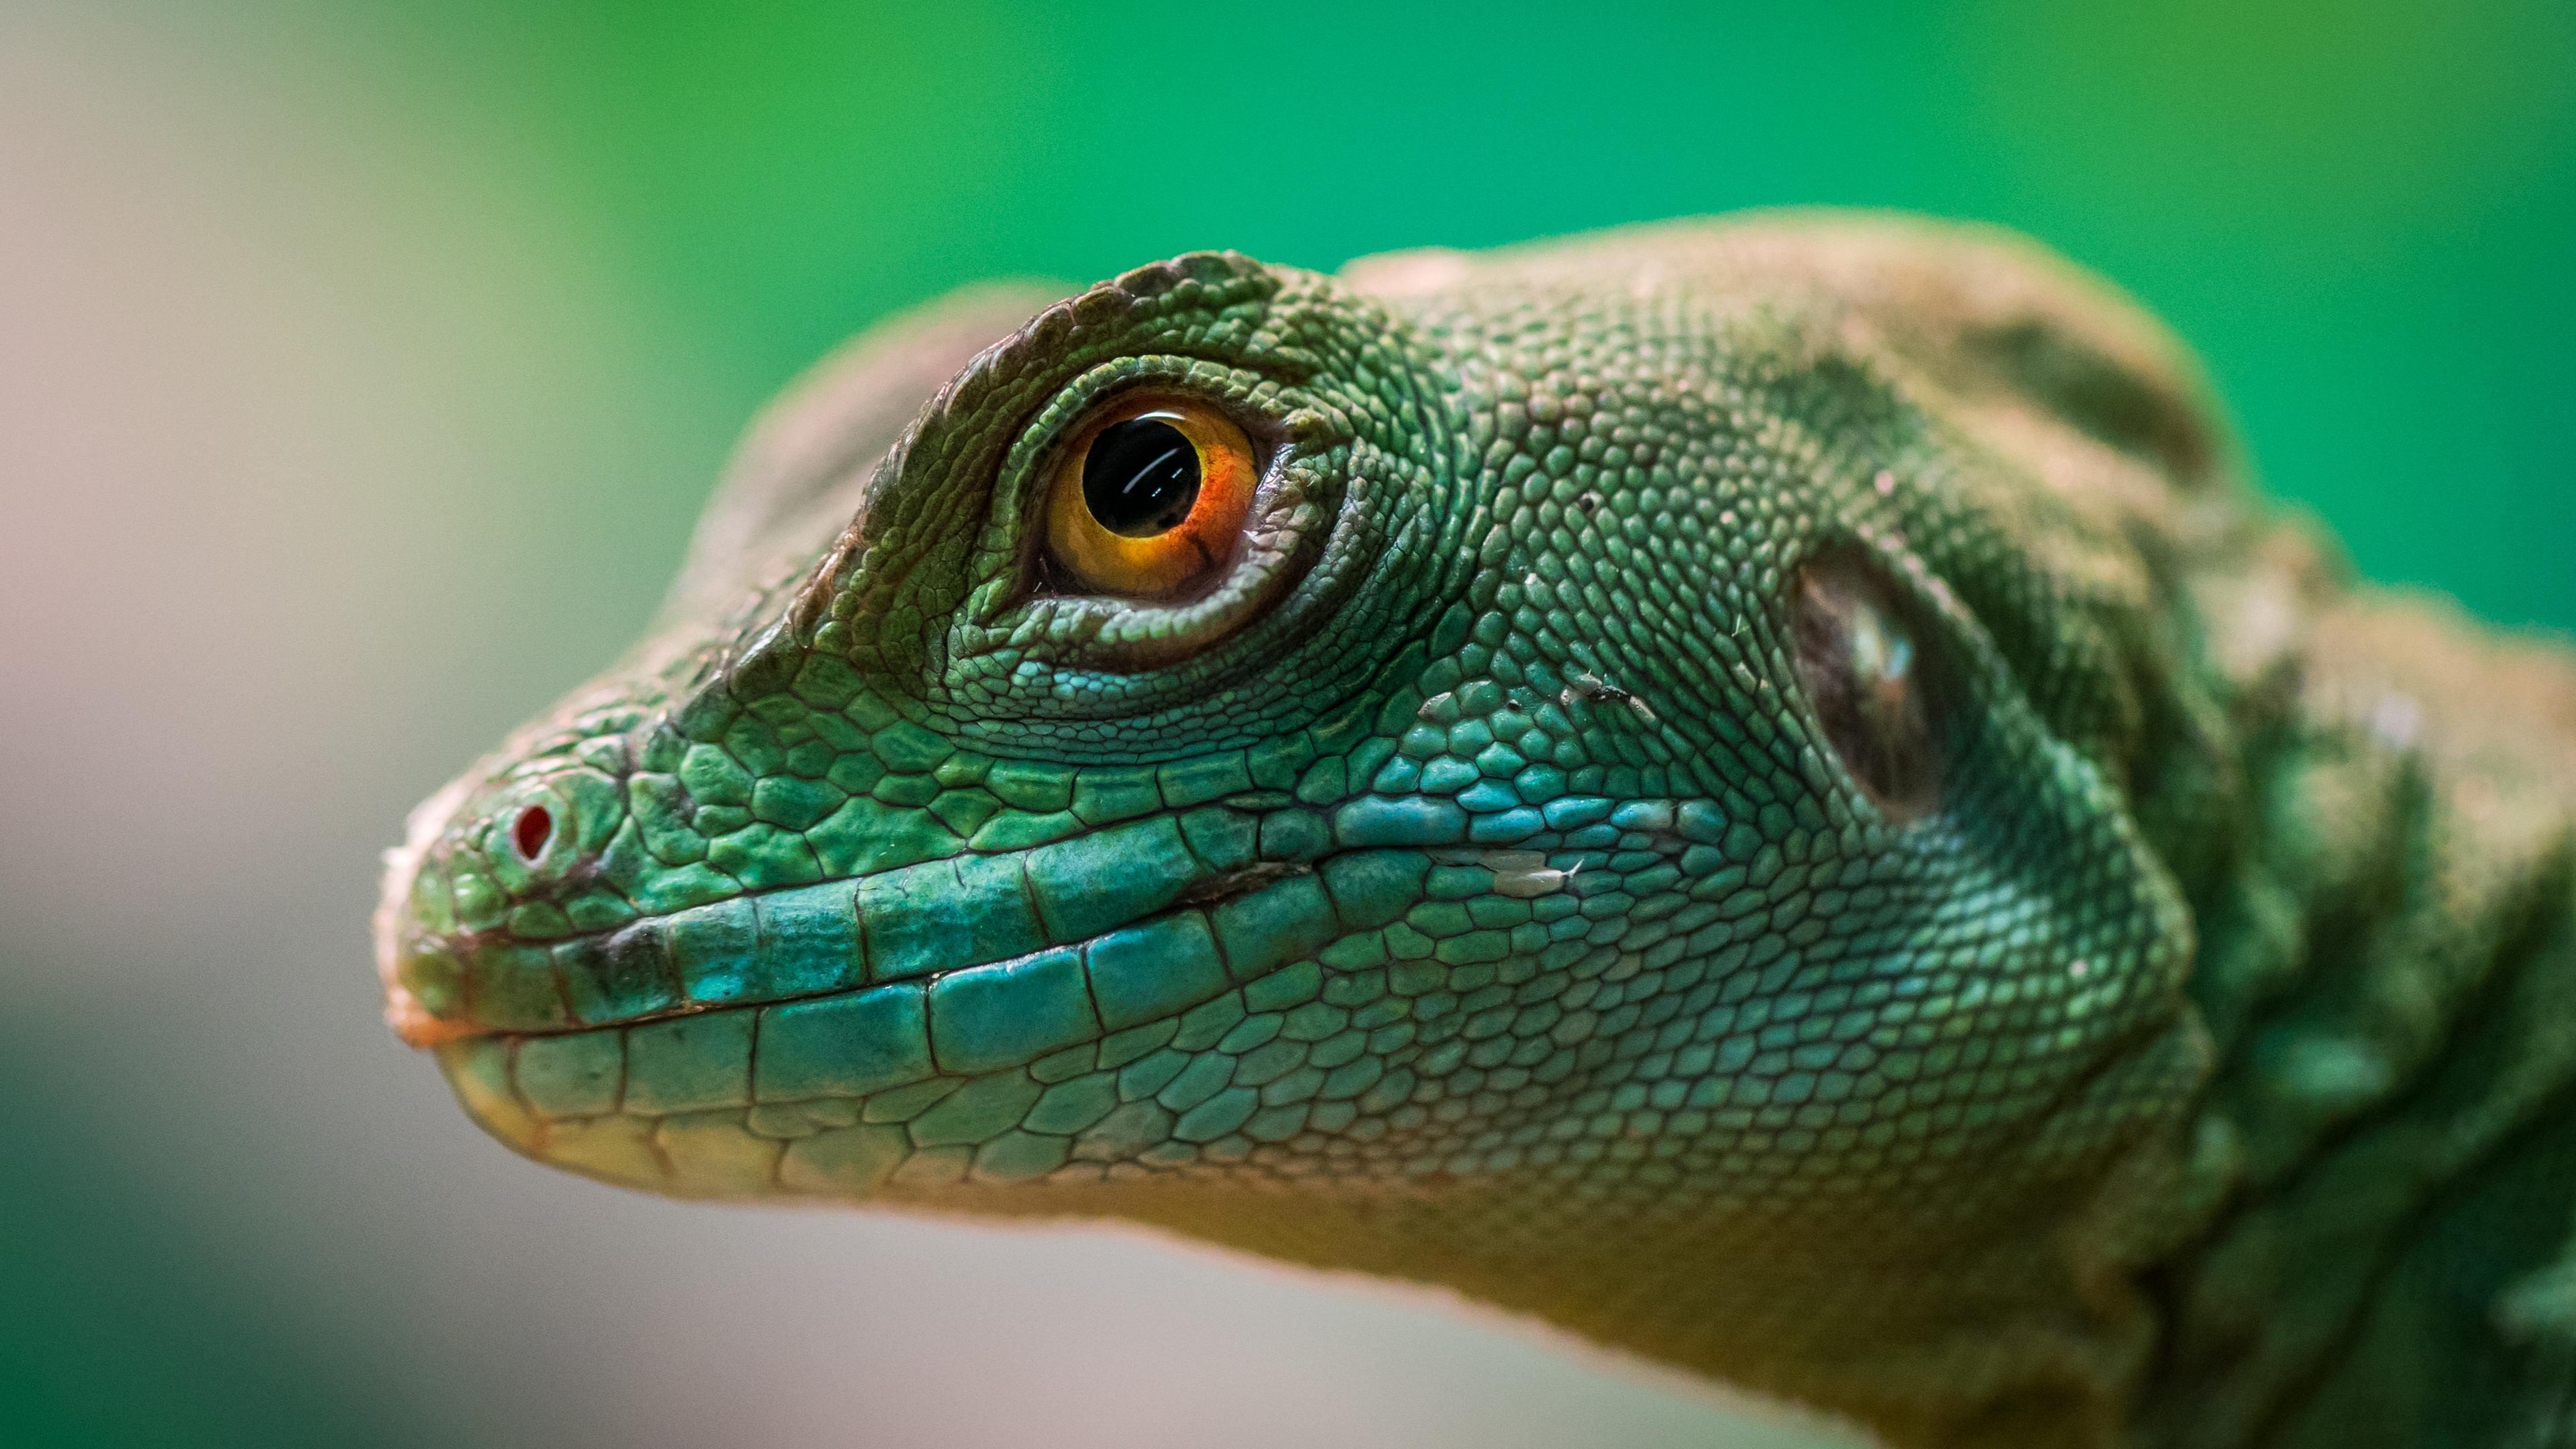 green lizard reptile macro 4k 1542239650 - Green Lizard Reptile Macro 4k - reptile wallpapers, macro wallpapers, lizard wallpapers, hd-wallpapers, animals wallpapers, 4k-wallpapers